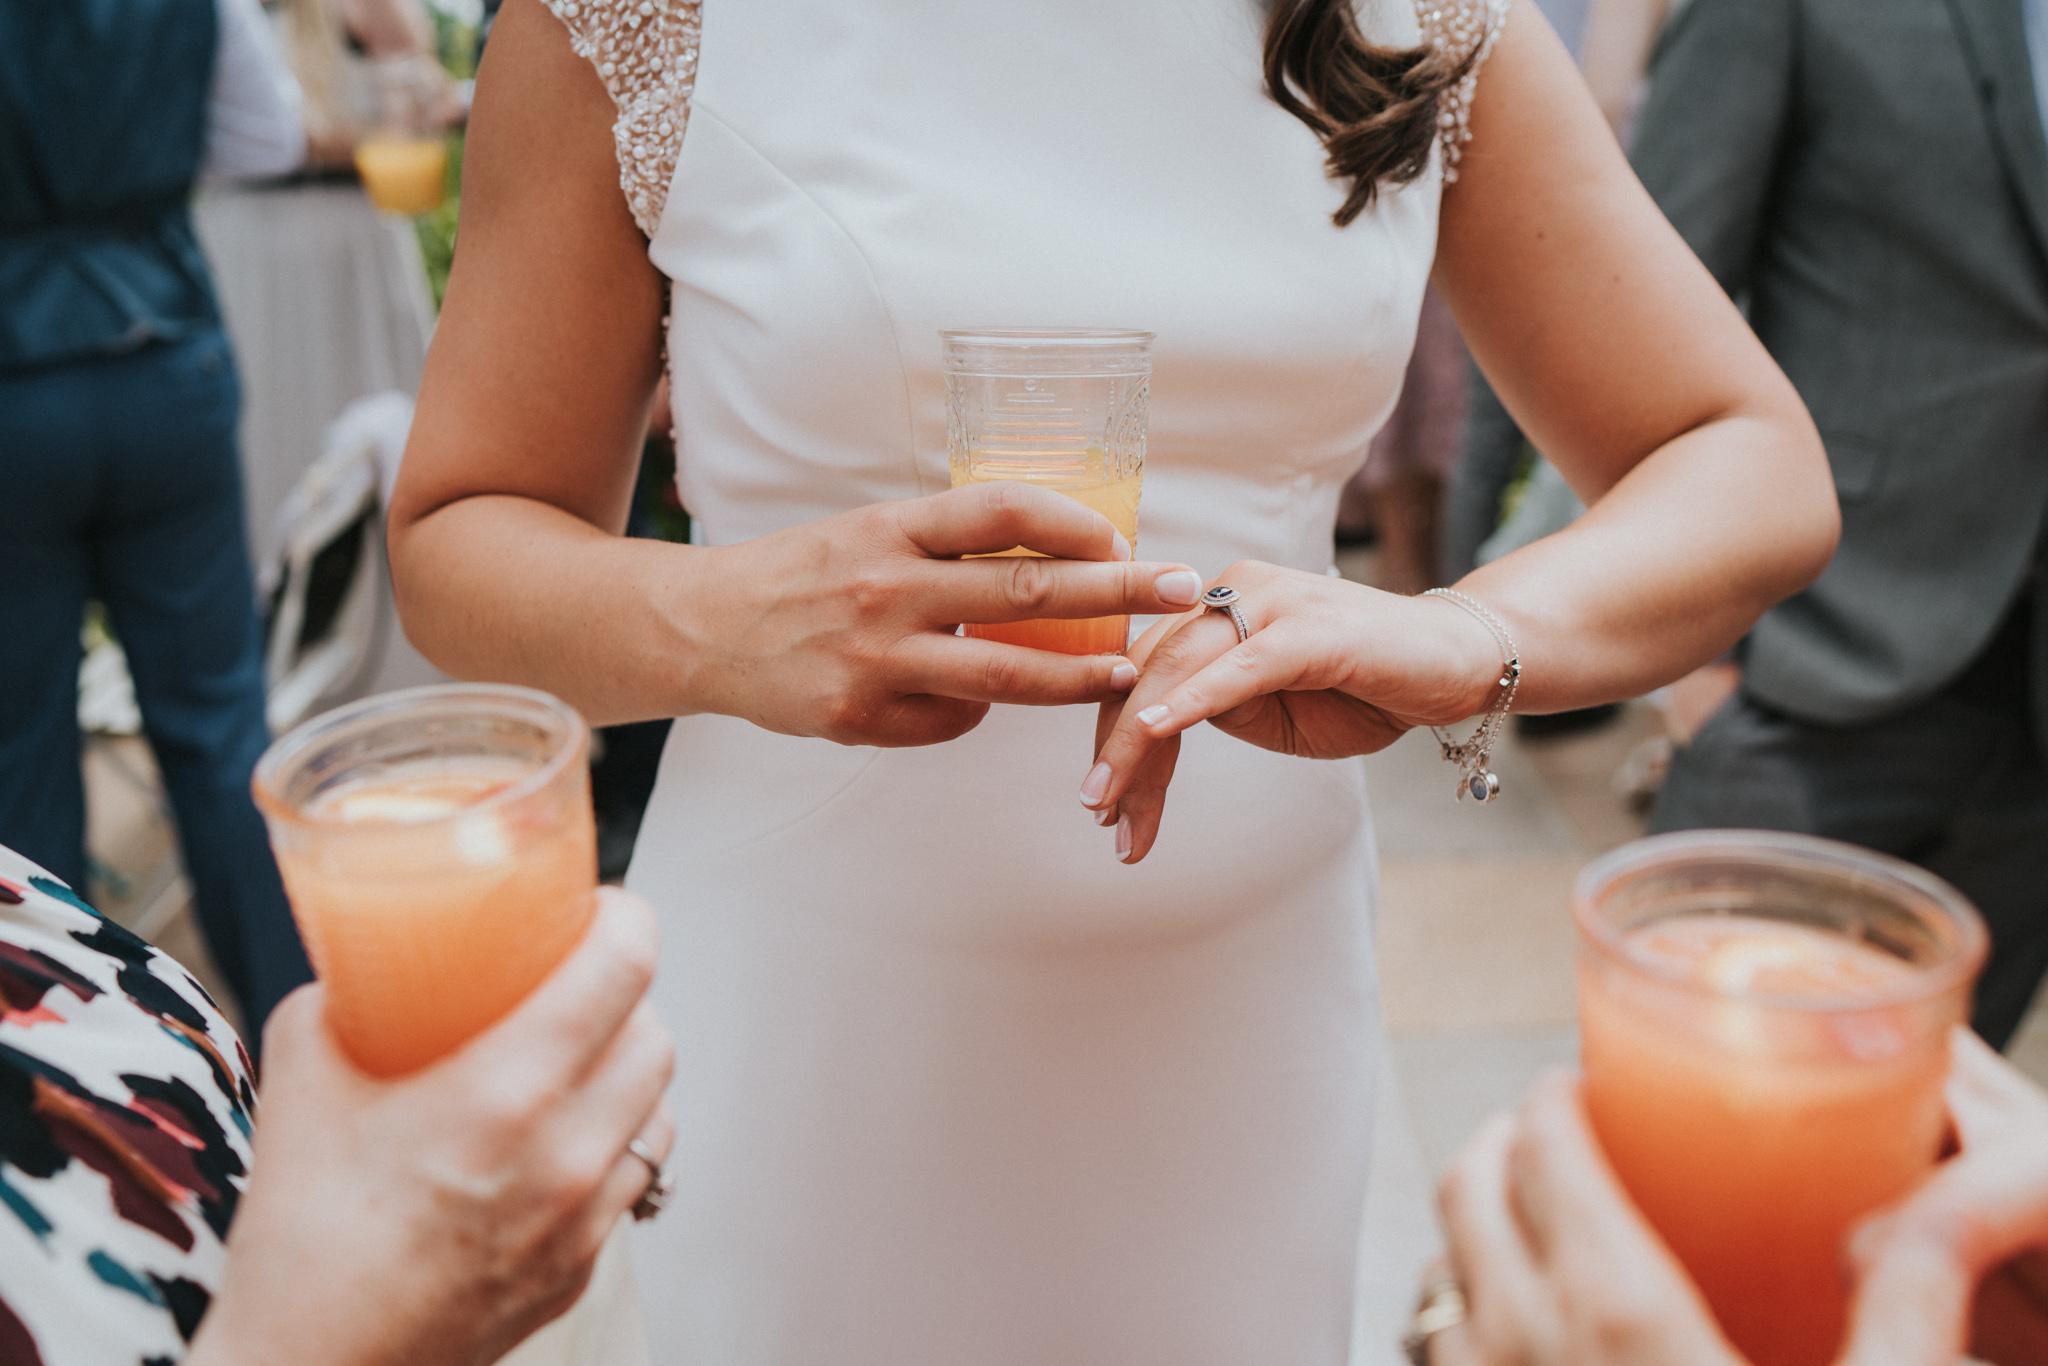 danielle-and-gareths-boho-wedding-previews-at-high-house-weddings-grace-elizabeth-colchester-essex-suffolk-norfolk-devon-alternative-wedding-and-lifestyle-photographer (37 of 76).jpg